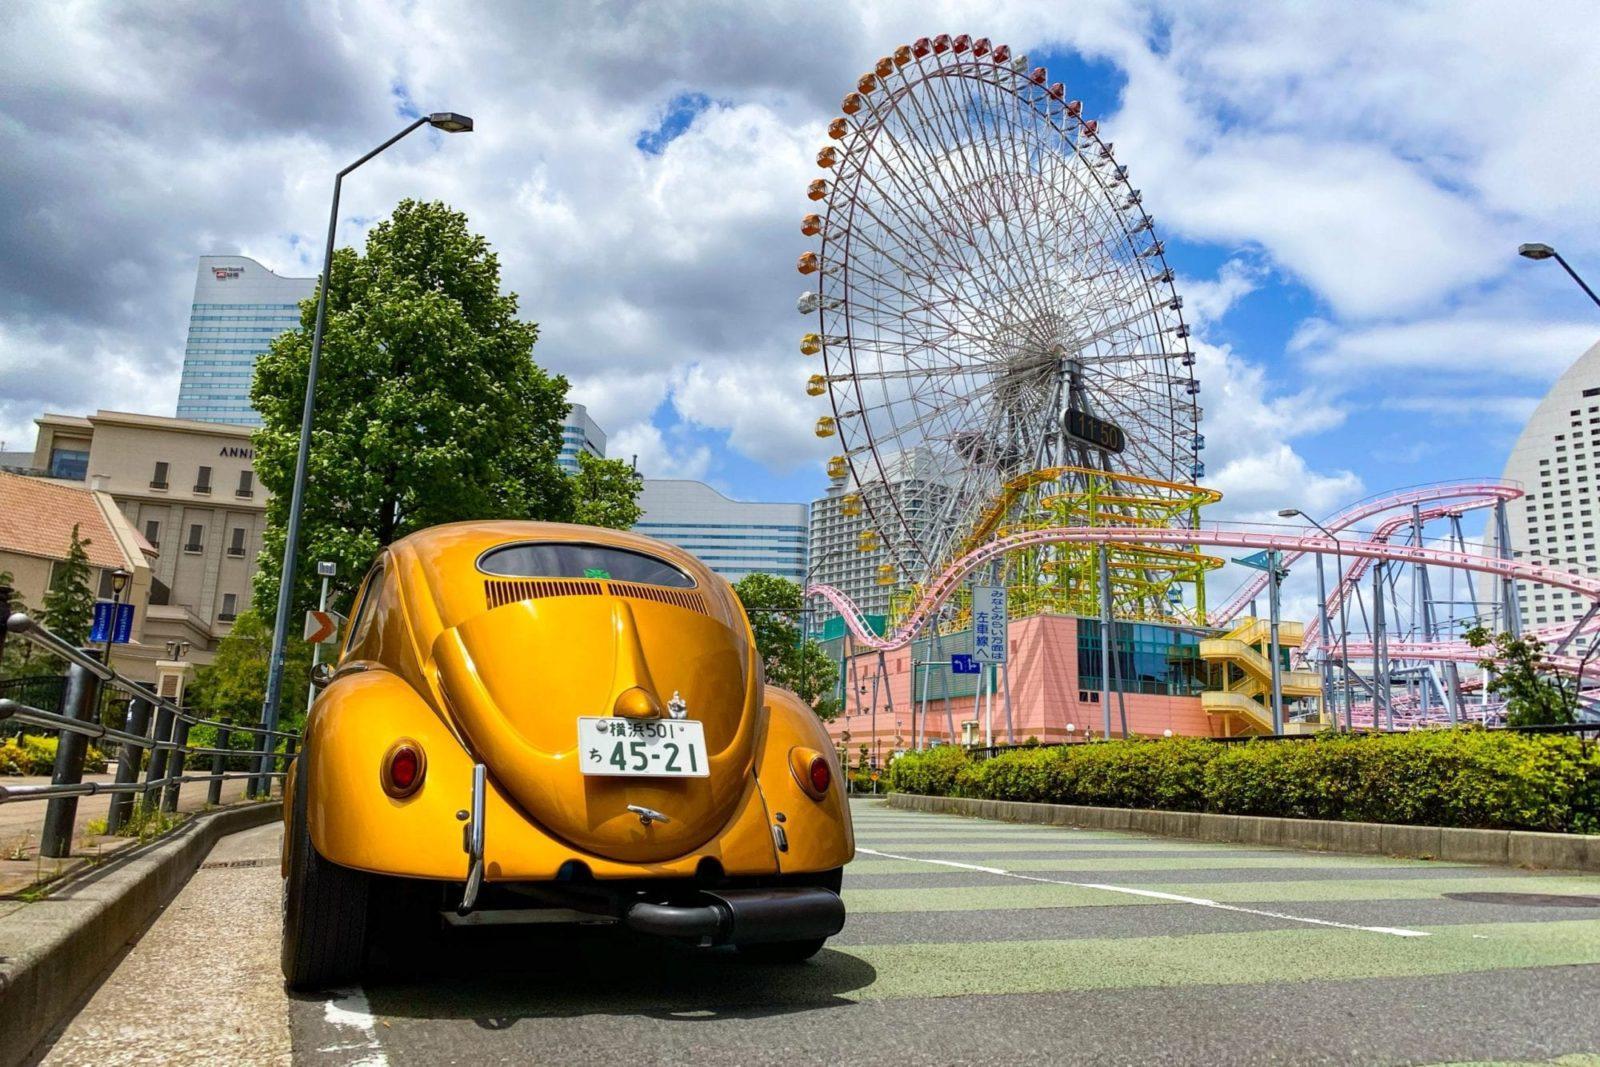 INPROFILE: MANABU'S 1956 OVAL BEETLE 'BEER GOLD'